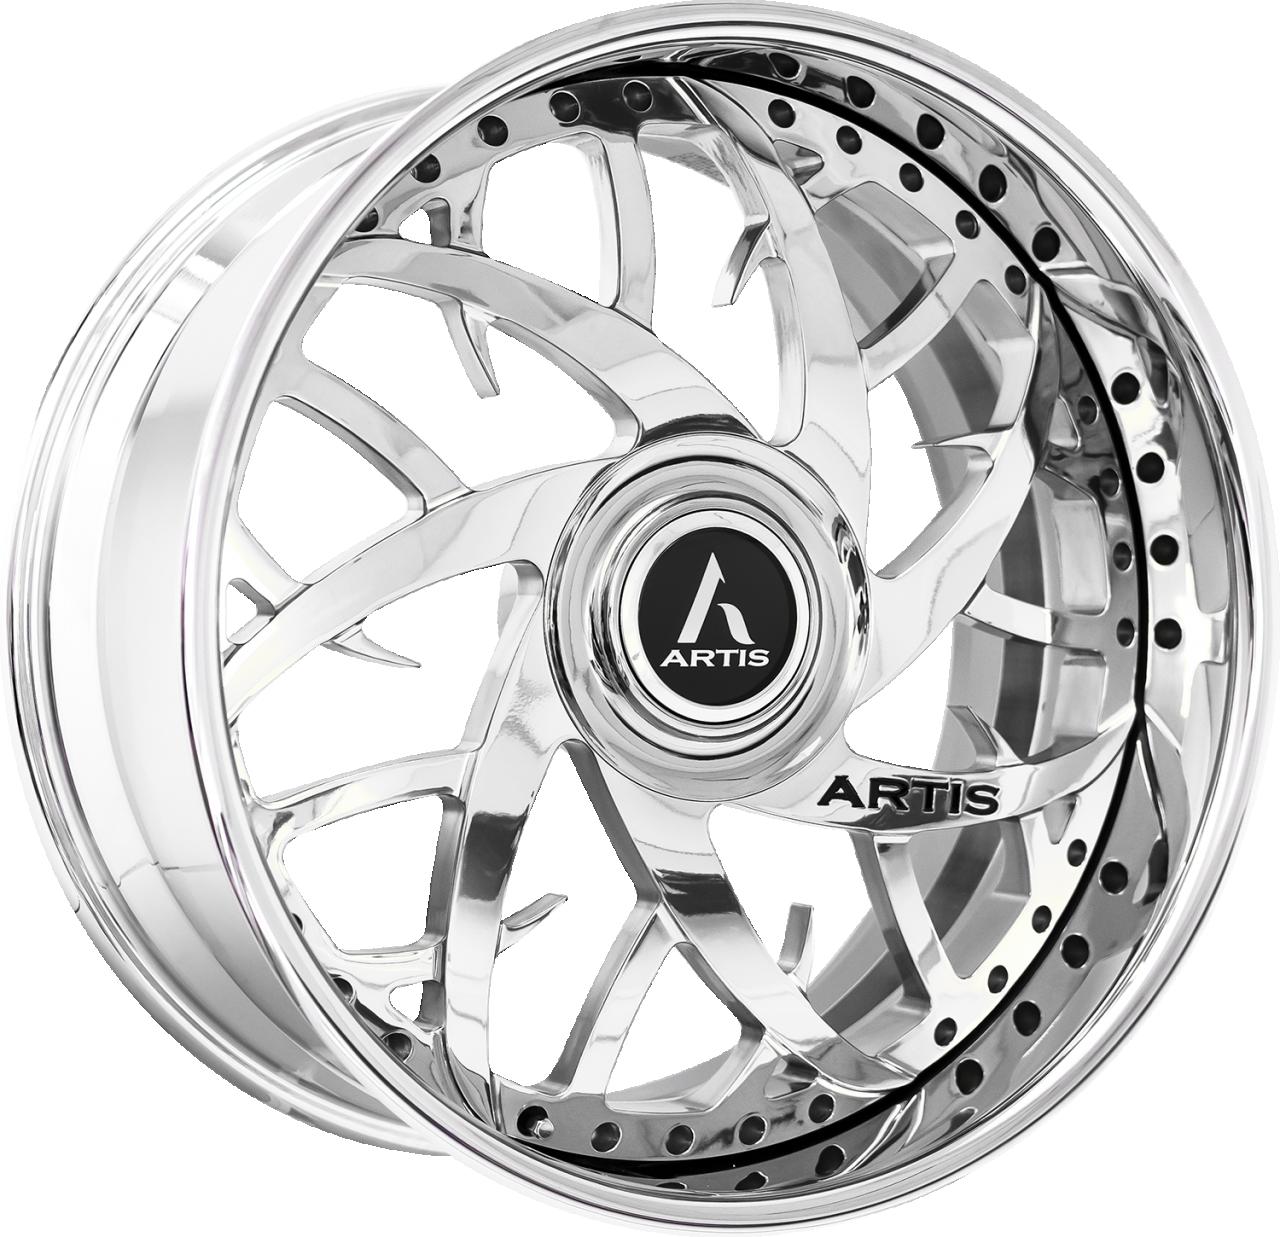 Artis Forged Harlem wheel with Chrome finish